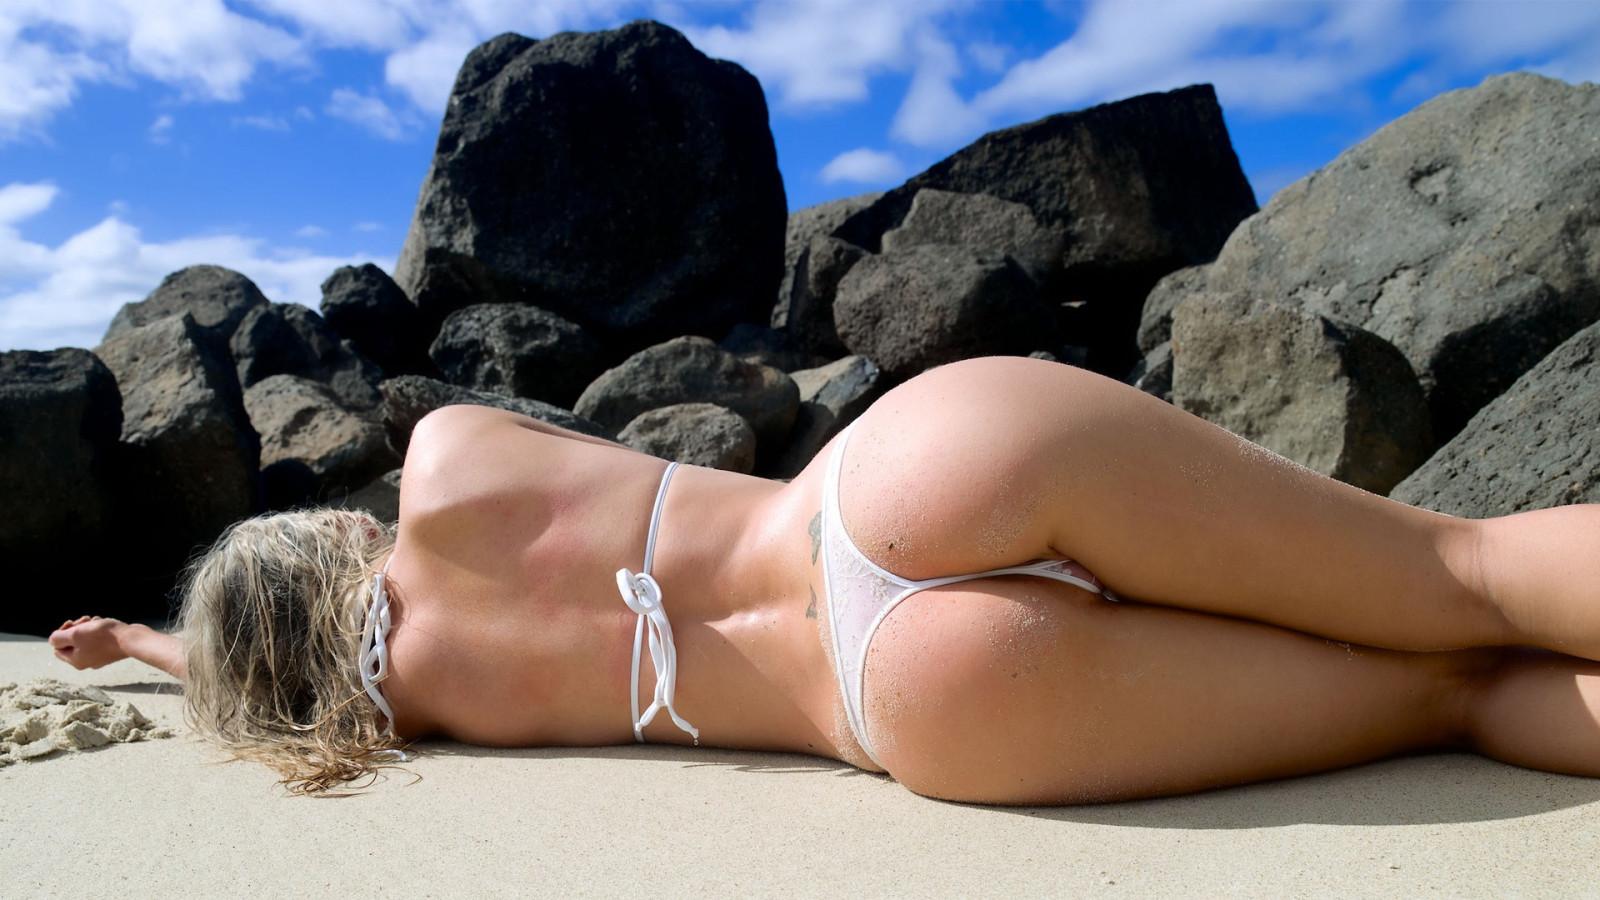 Откровенные бикини на пляже фото крупно #14